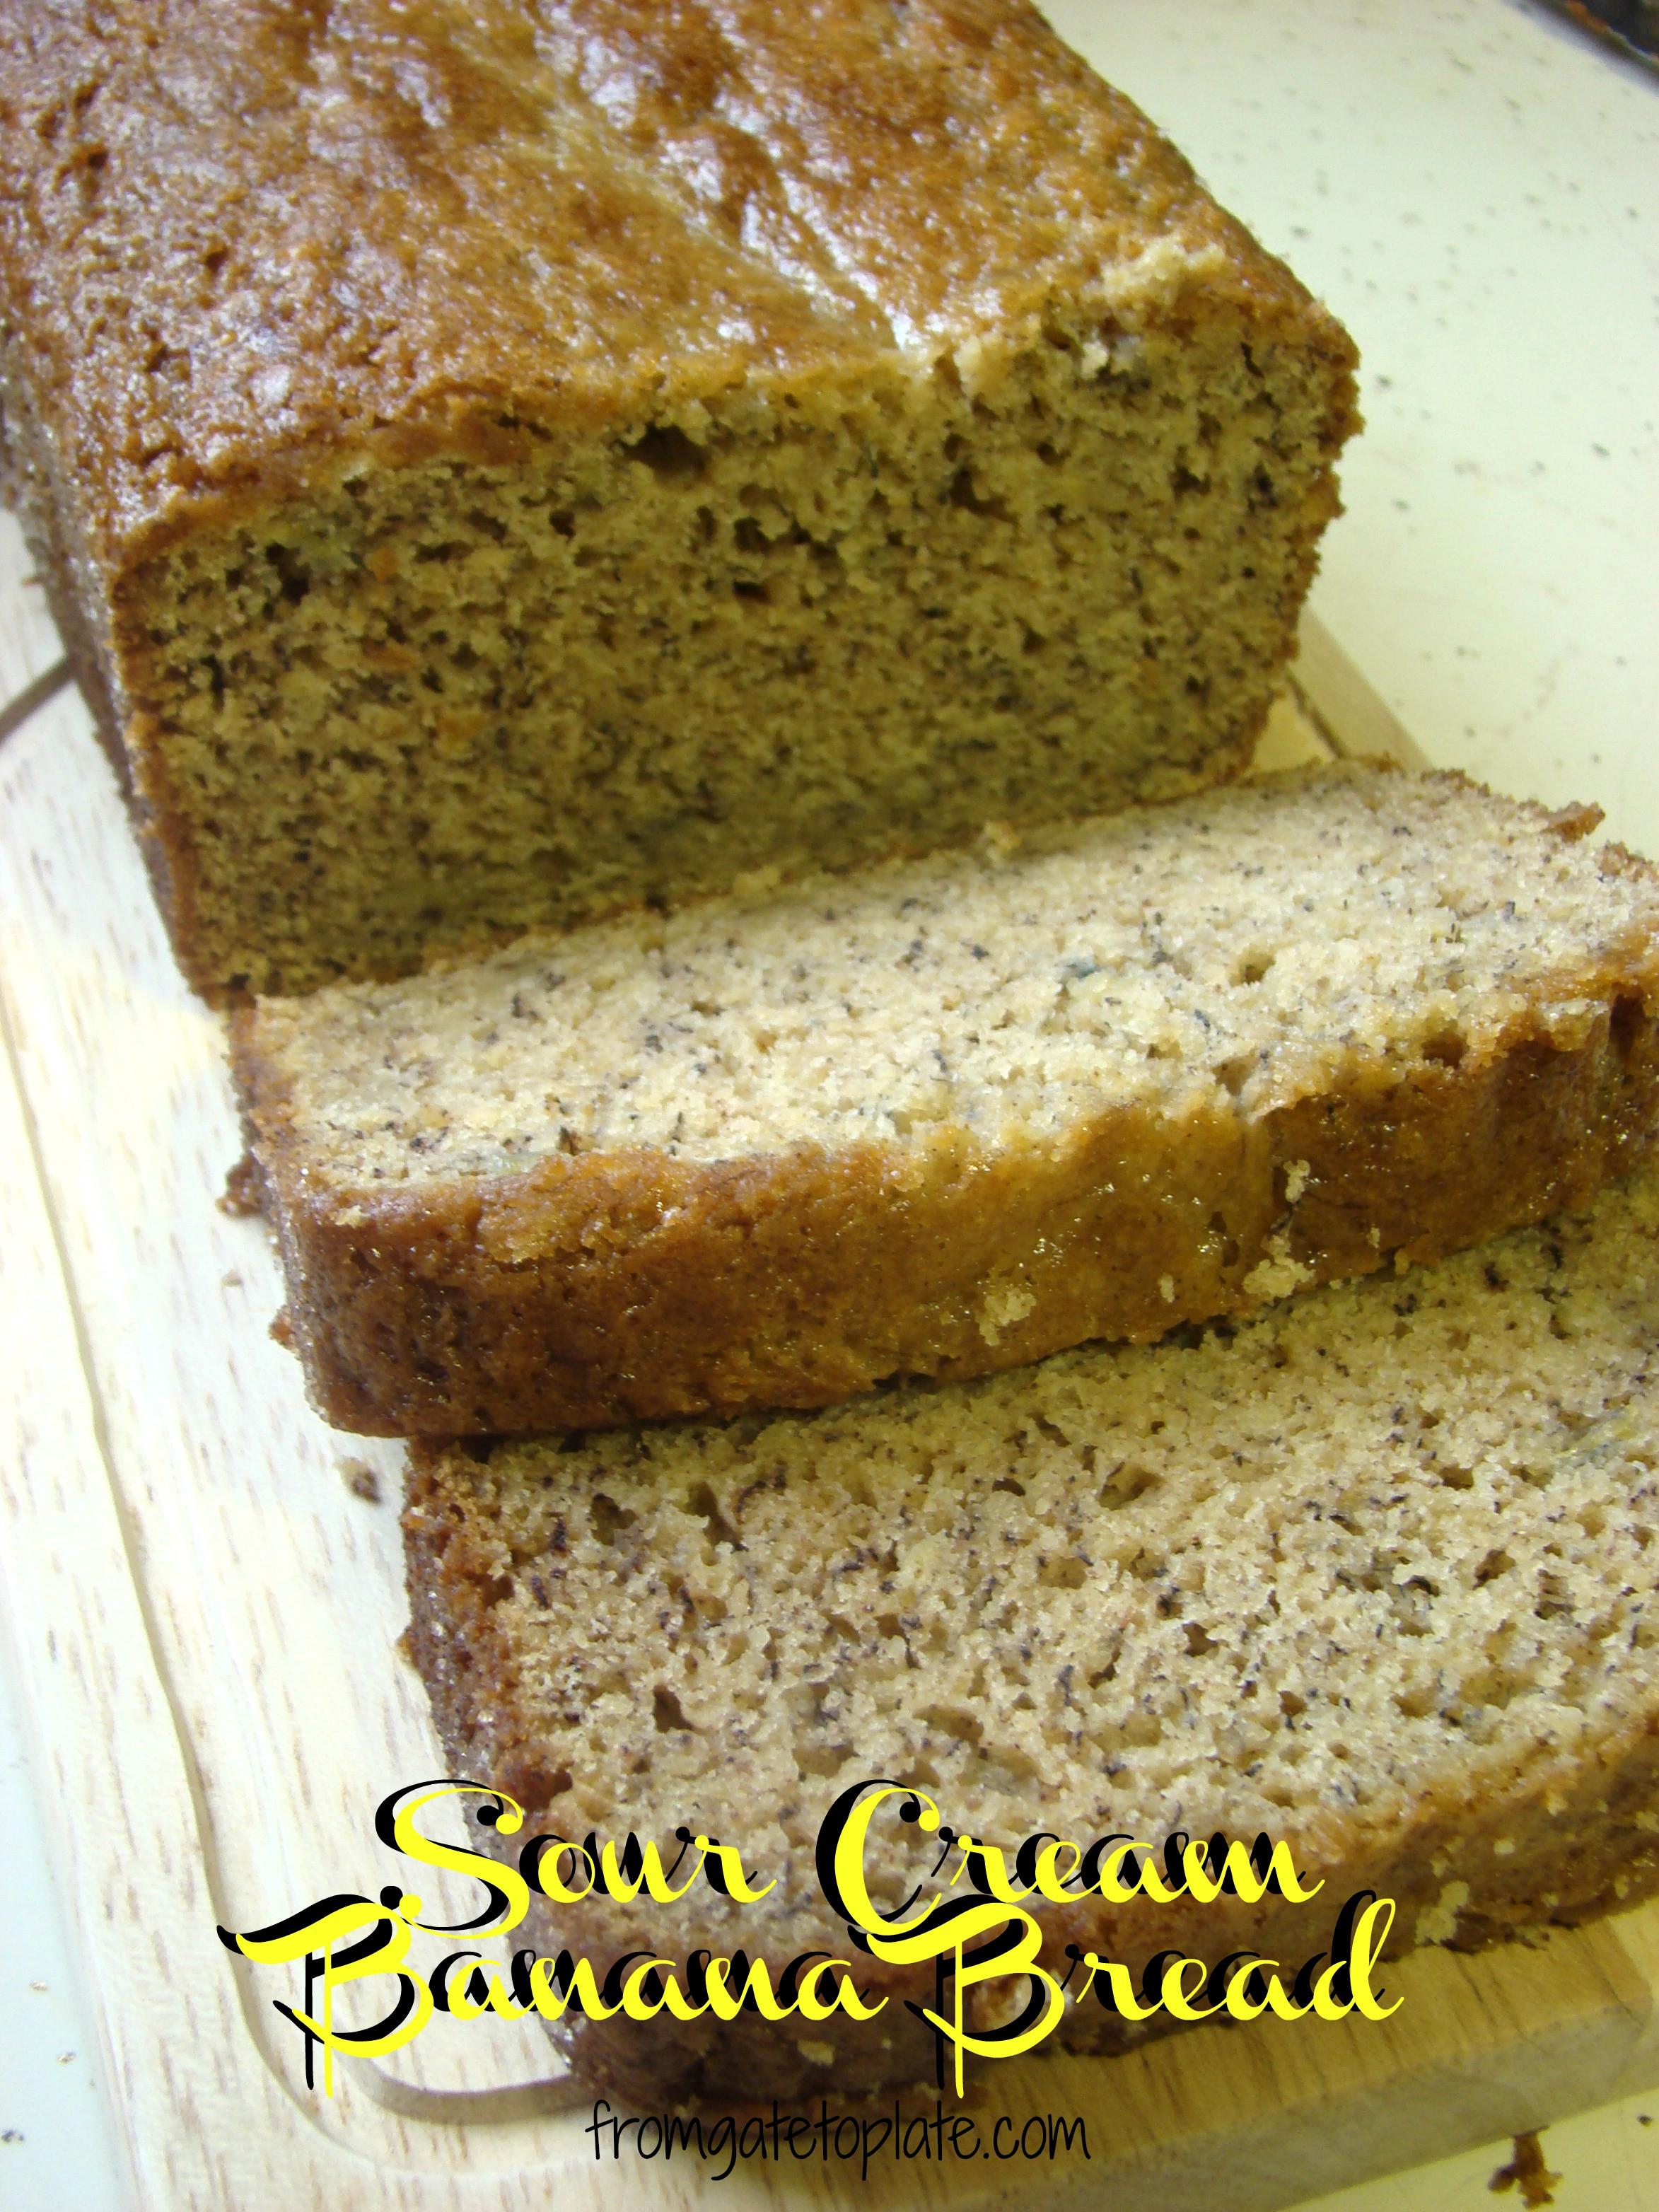 Sour Cream Banana Bread  Sour Cream Banana Bread From Gate to Plate